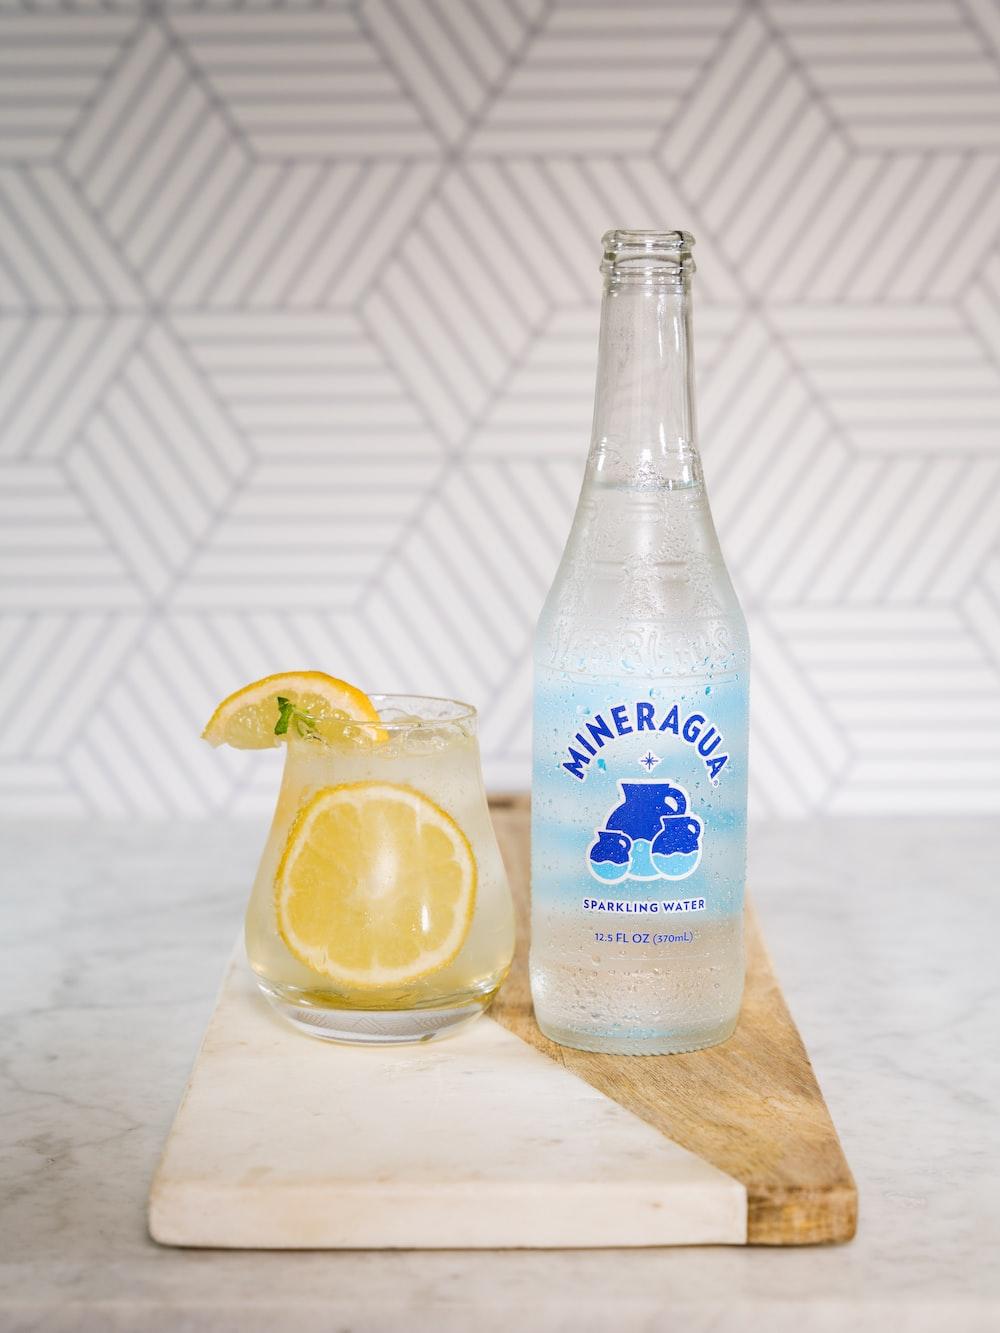 clear glass bottle beside clear drinking glass with lemon juice